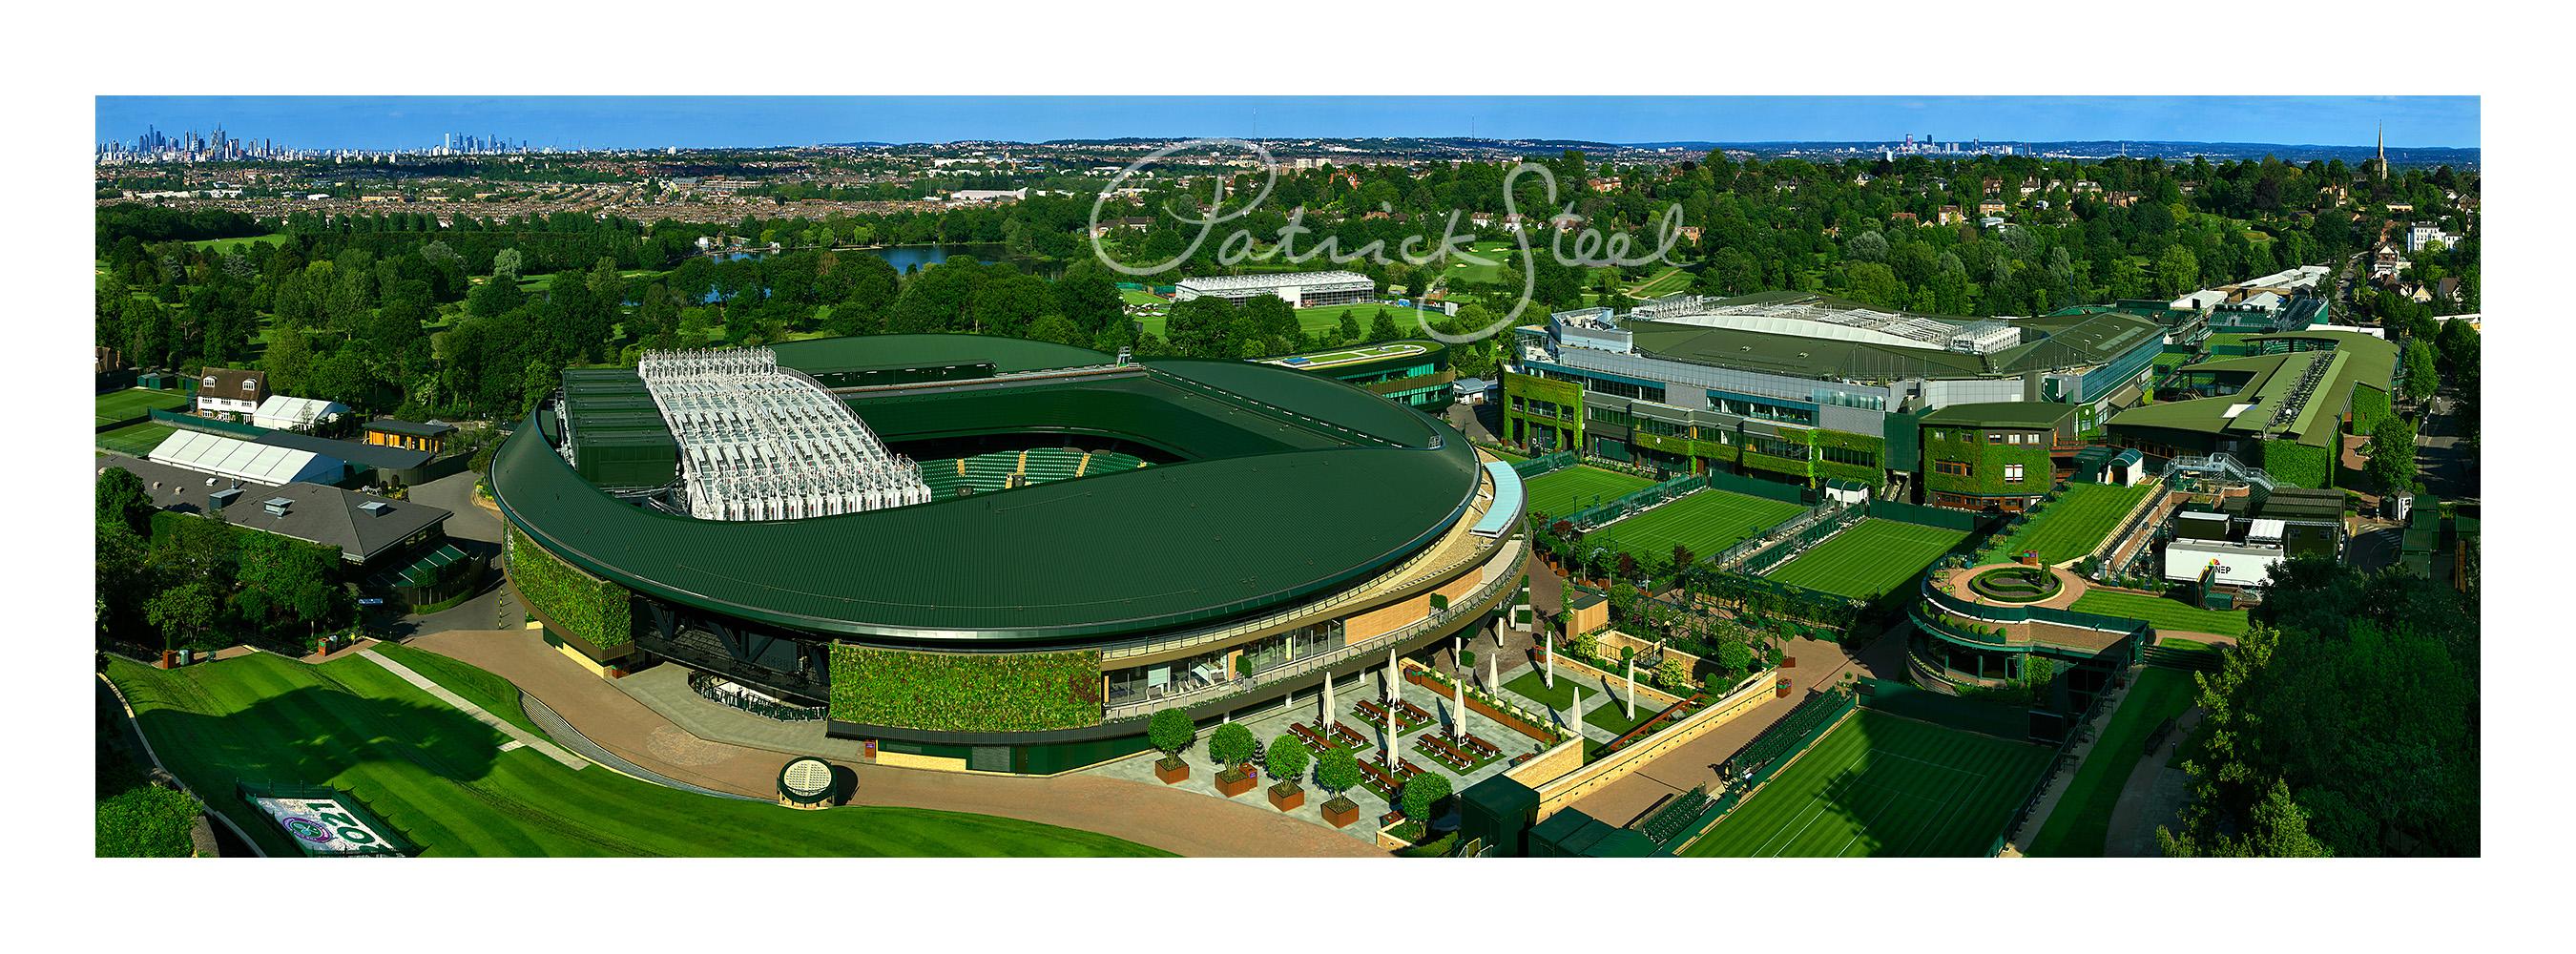 Title: Wimbledon Tennis 2021 | Details coming soon...